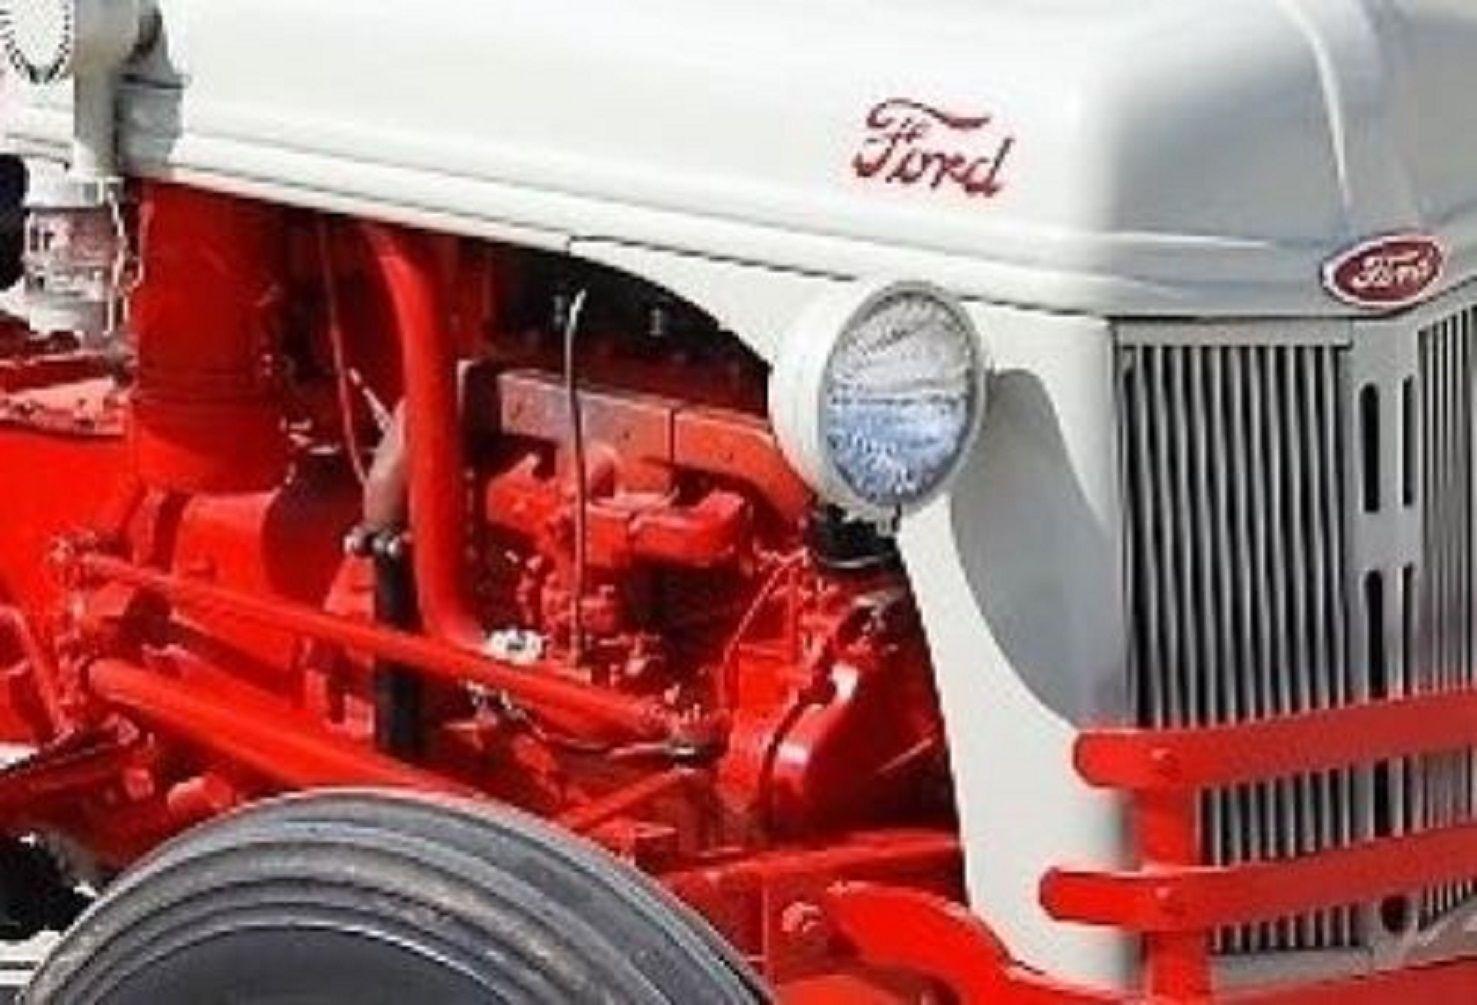 ford tractor 2n 8n 9n engine overhaul kit in frame ford tractors rh pinterest com